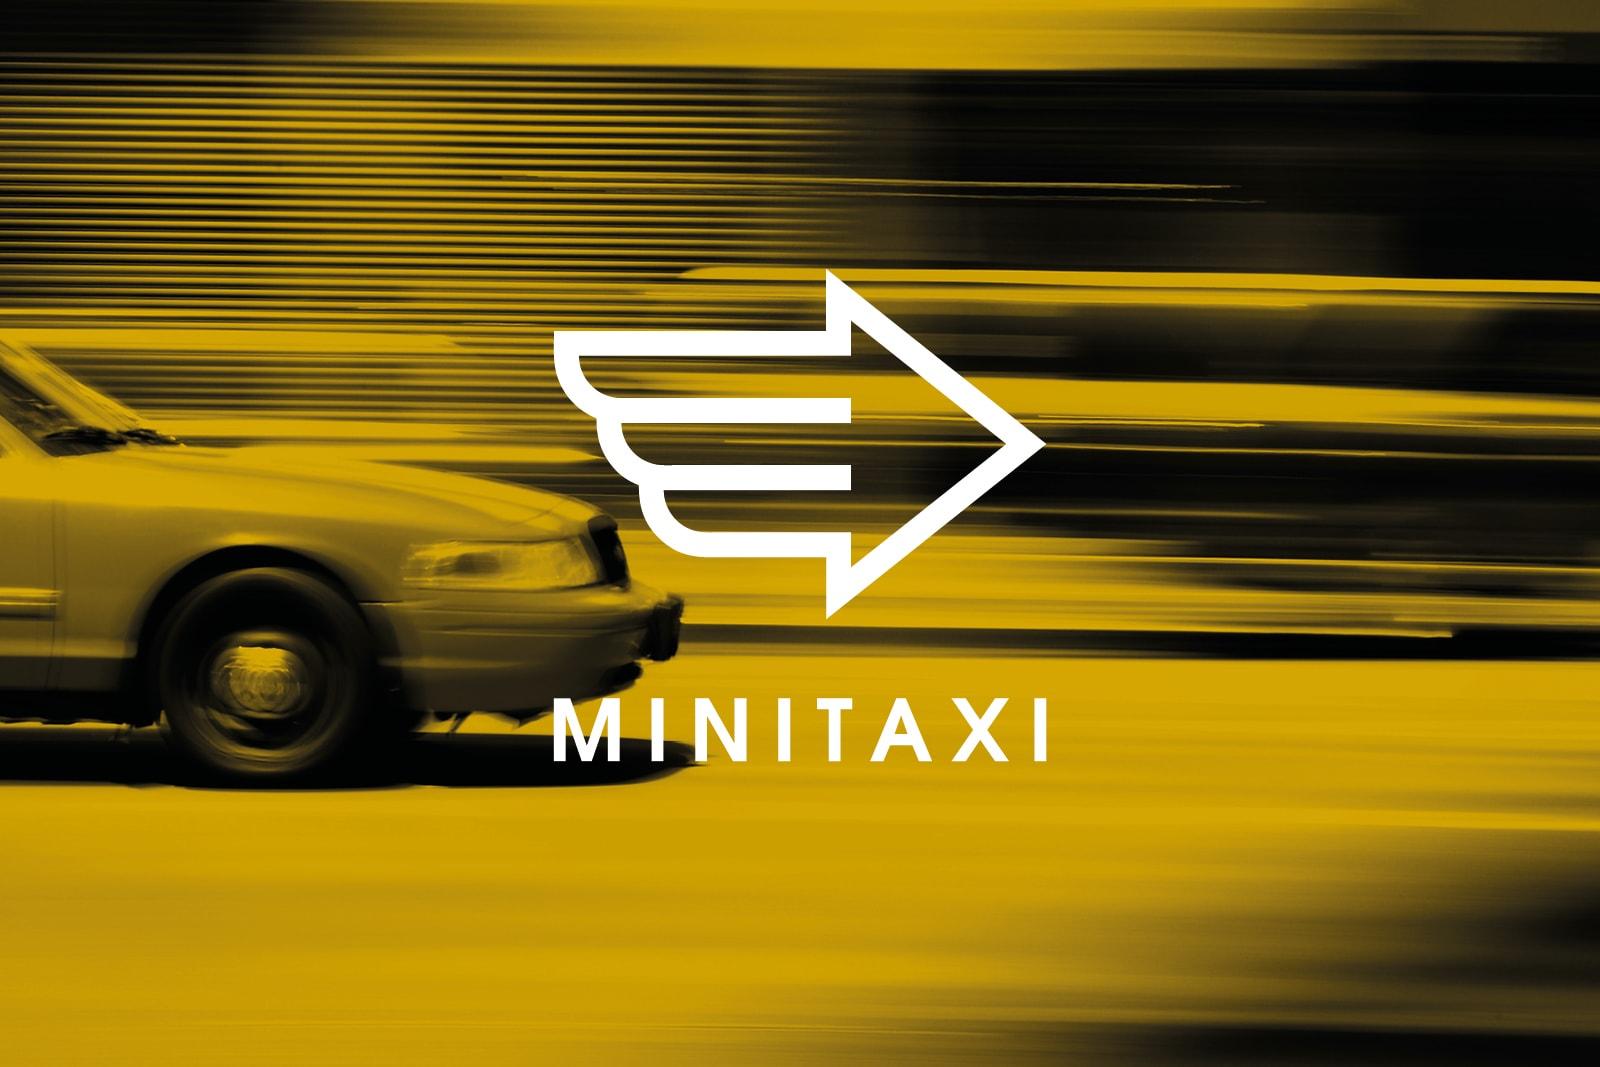 Minitaxi